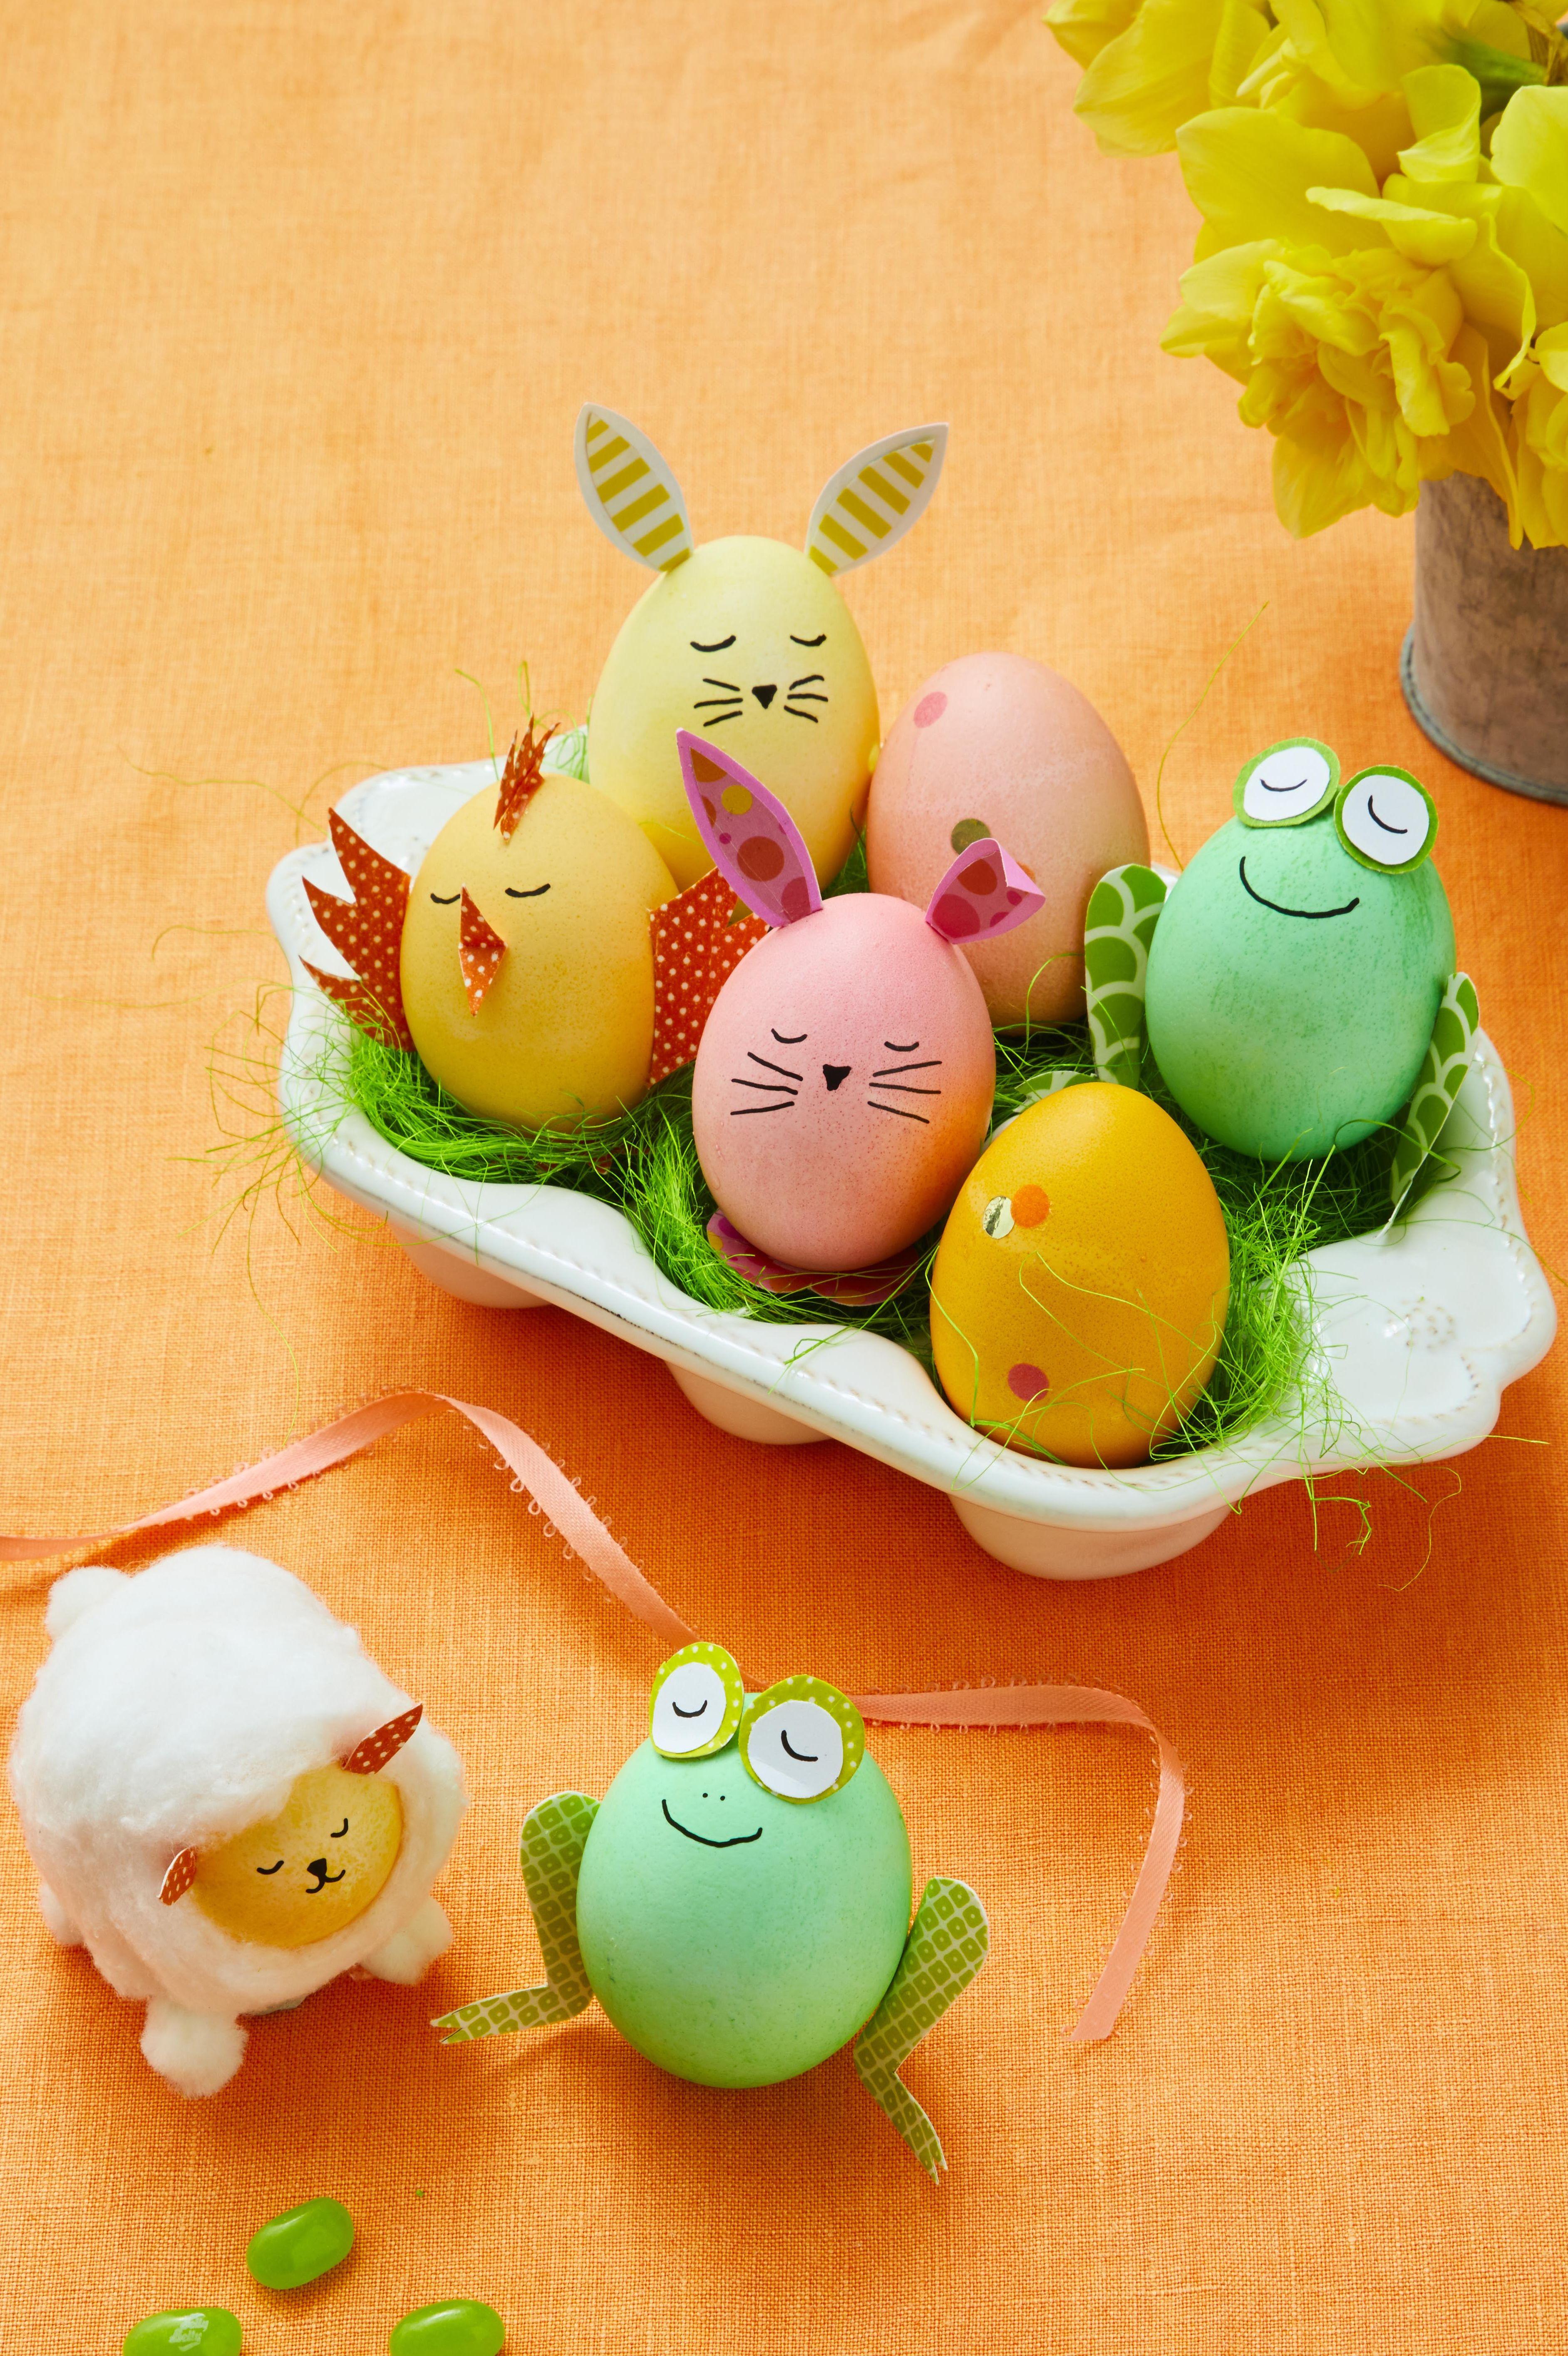 bunny egg chick egg sheep egg frog egg